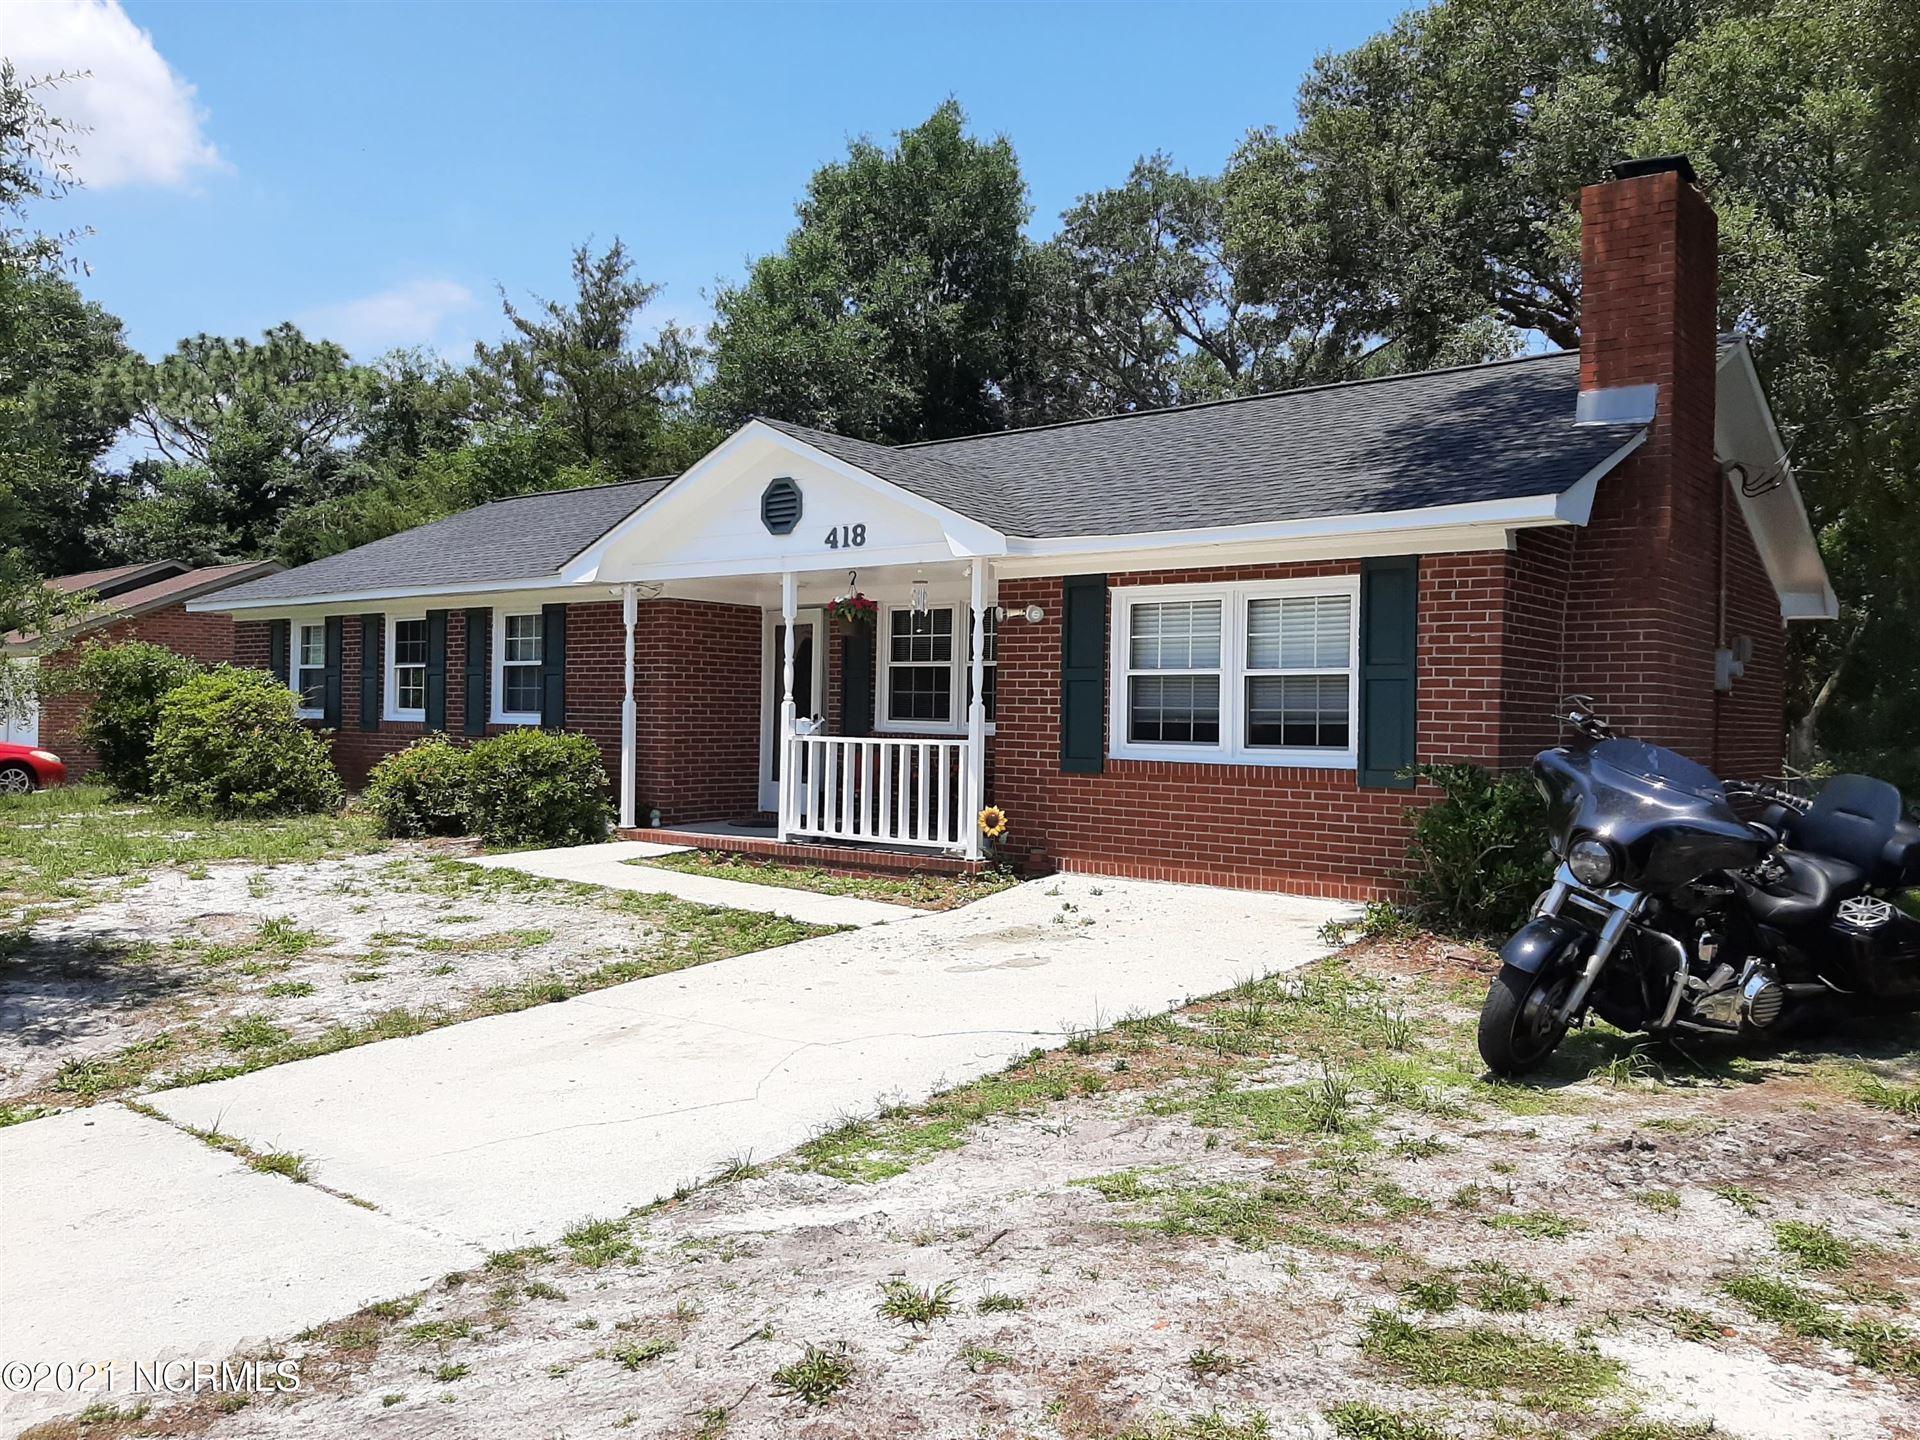 Photo of 418 Cathay Road, Wilmington, NC 28412 (MLS # 100276602)